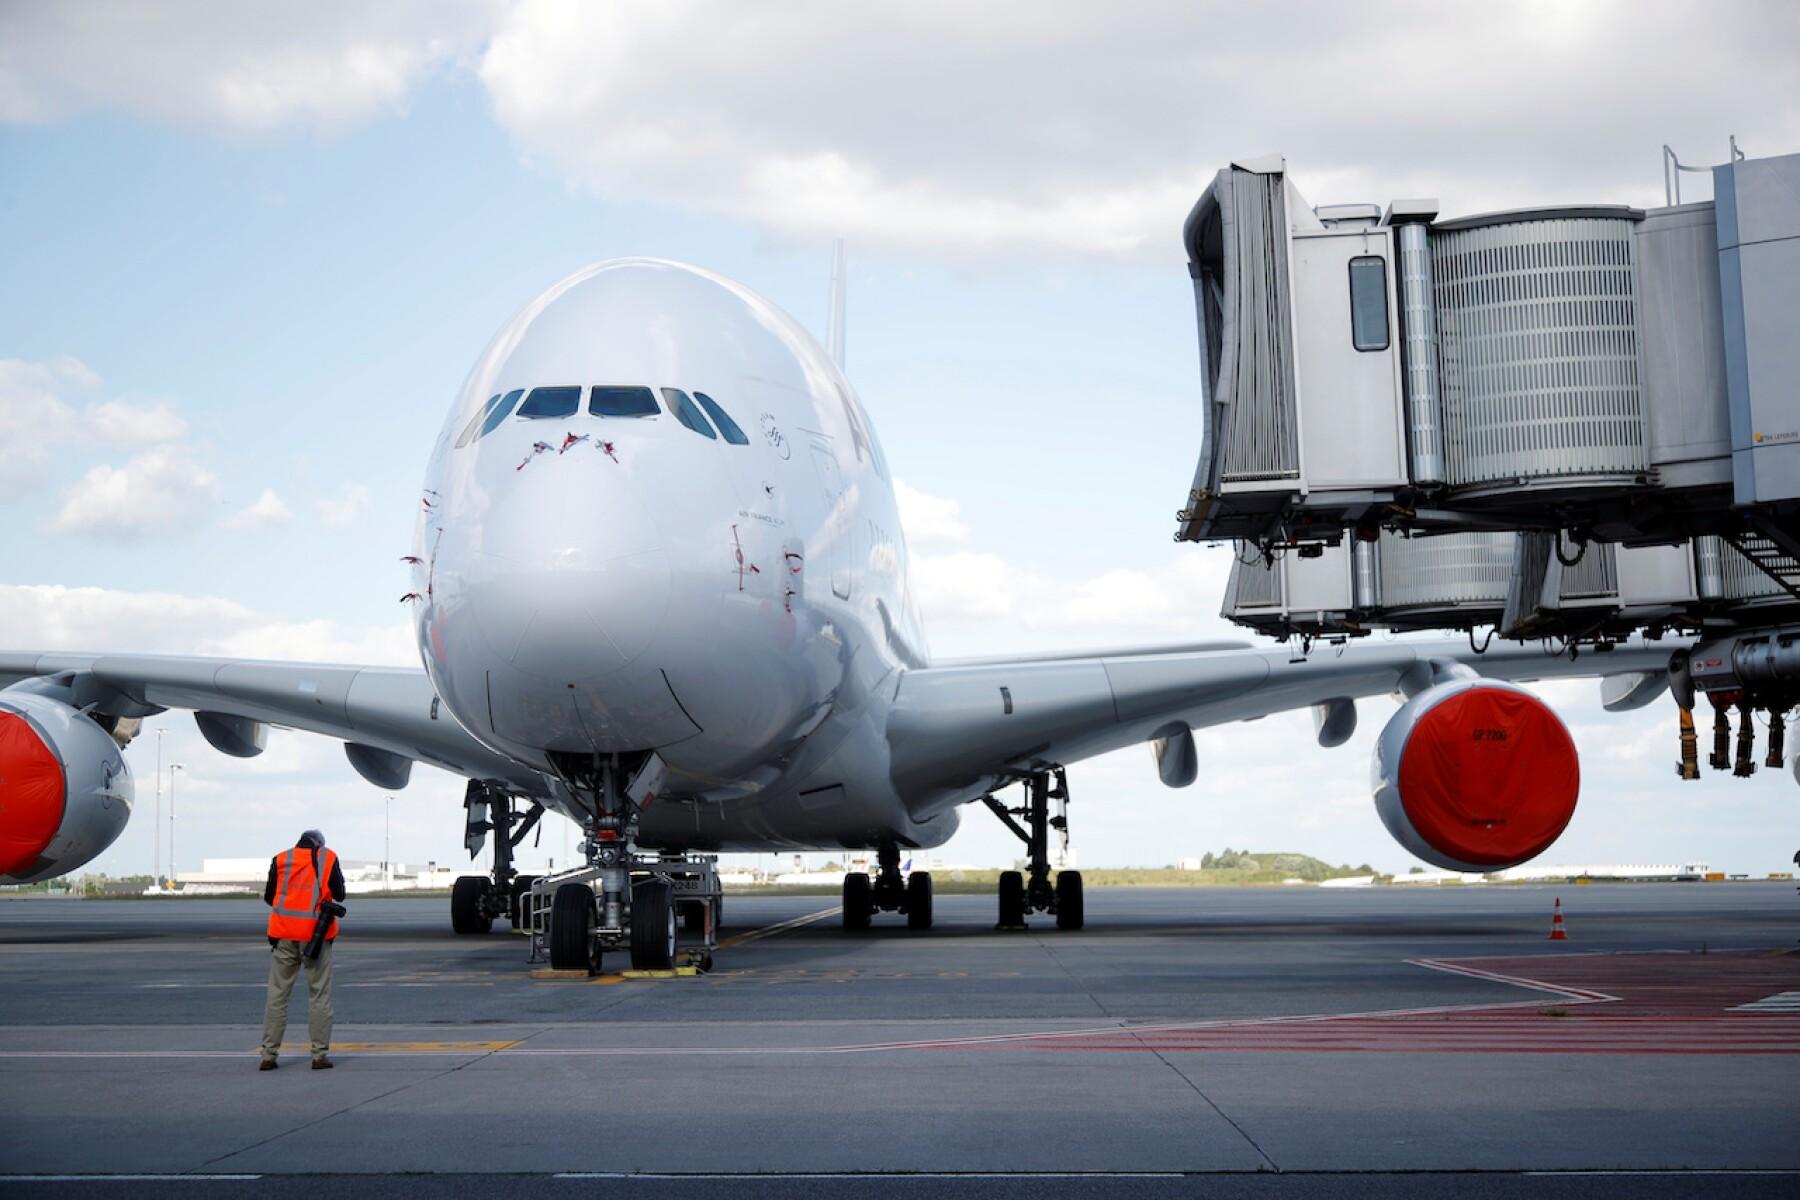 Airplanes at Paris Charles de Gaulle airport in Roissy-en-France